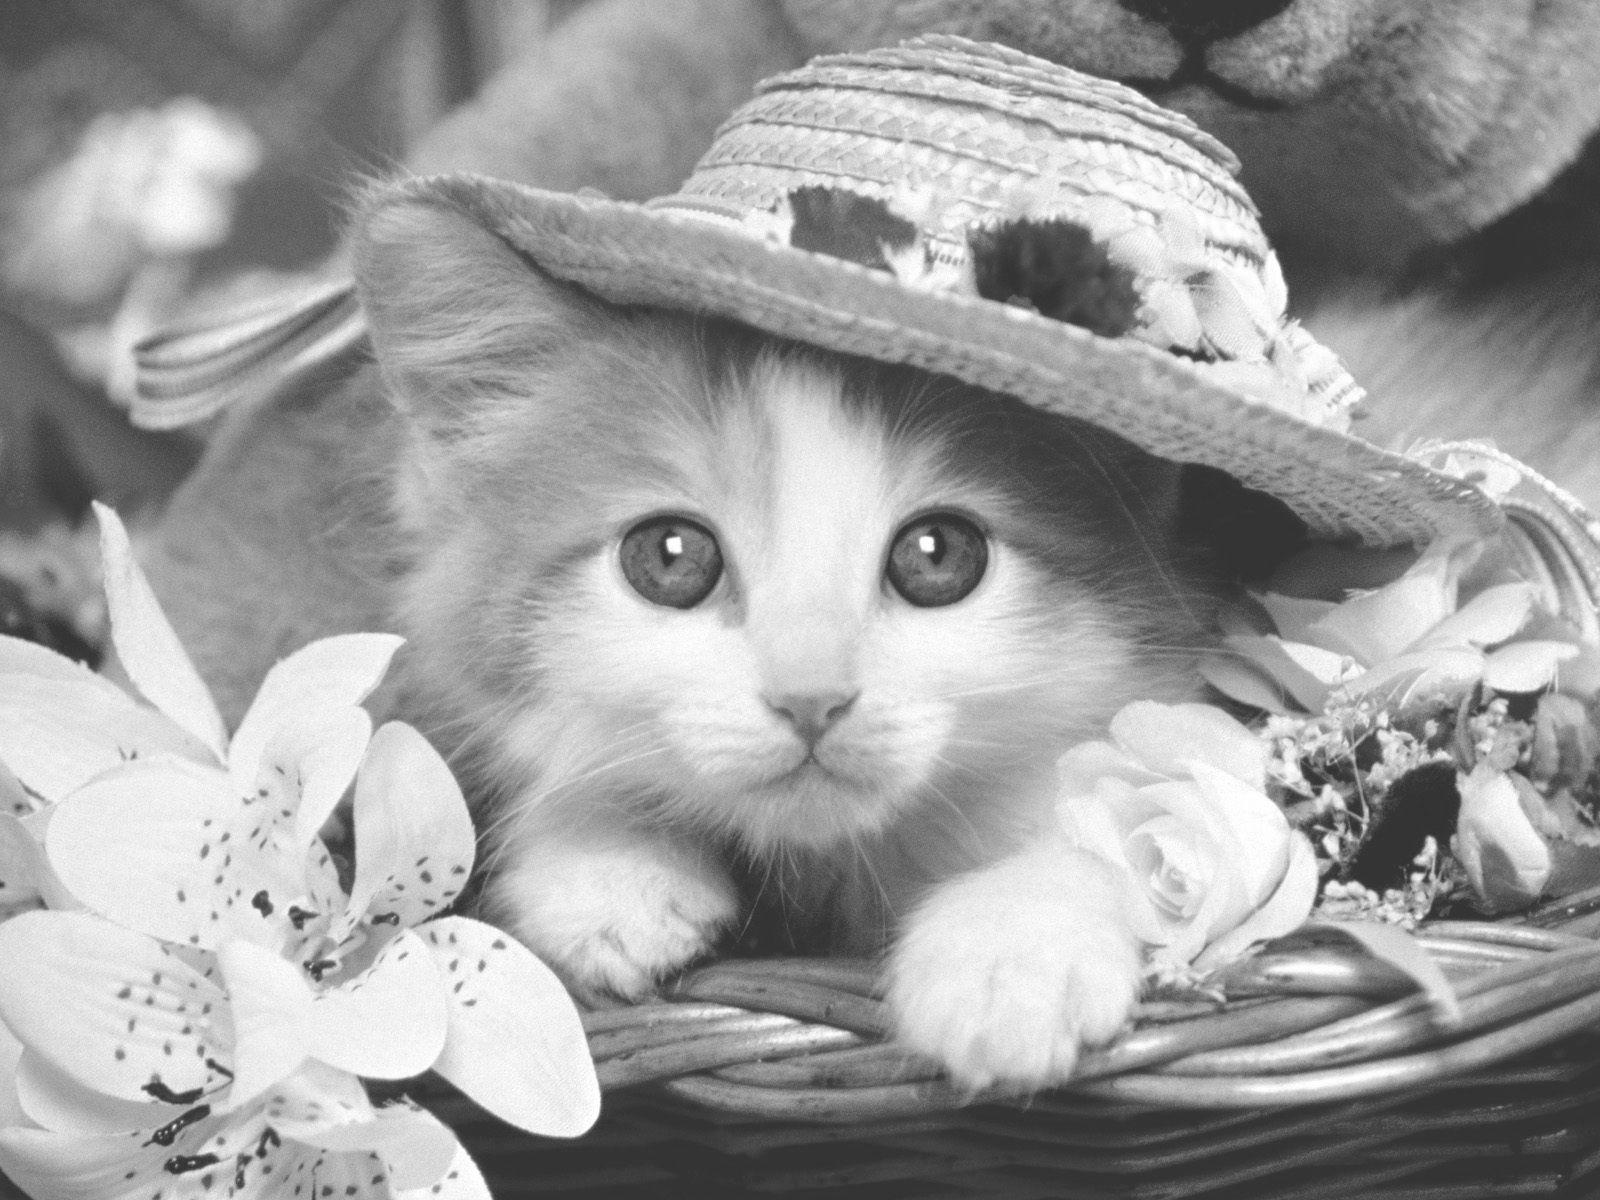 Kleurplaten Baby Katjes.Kleurplaat Animals Katten Katzen Katzen Bilder En Schone